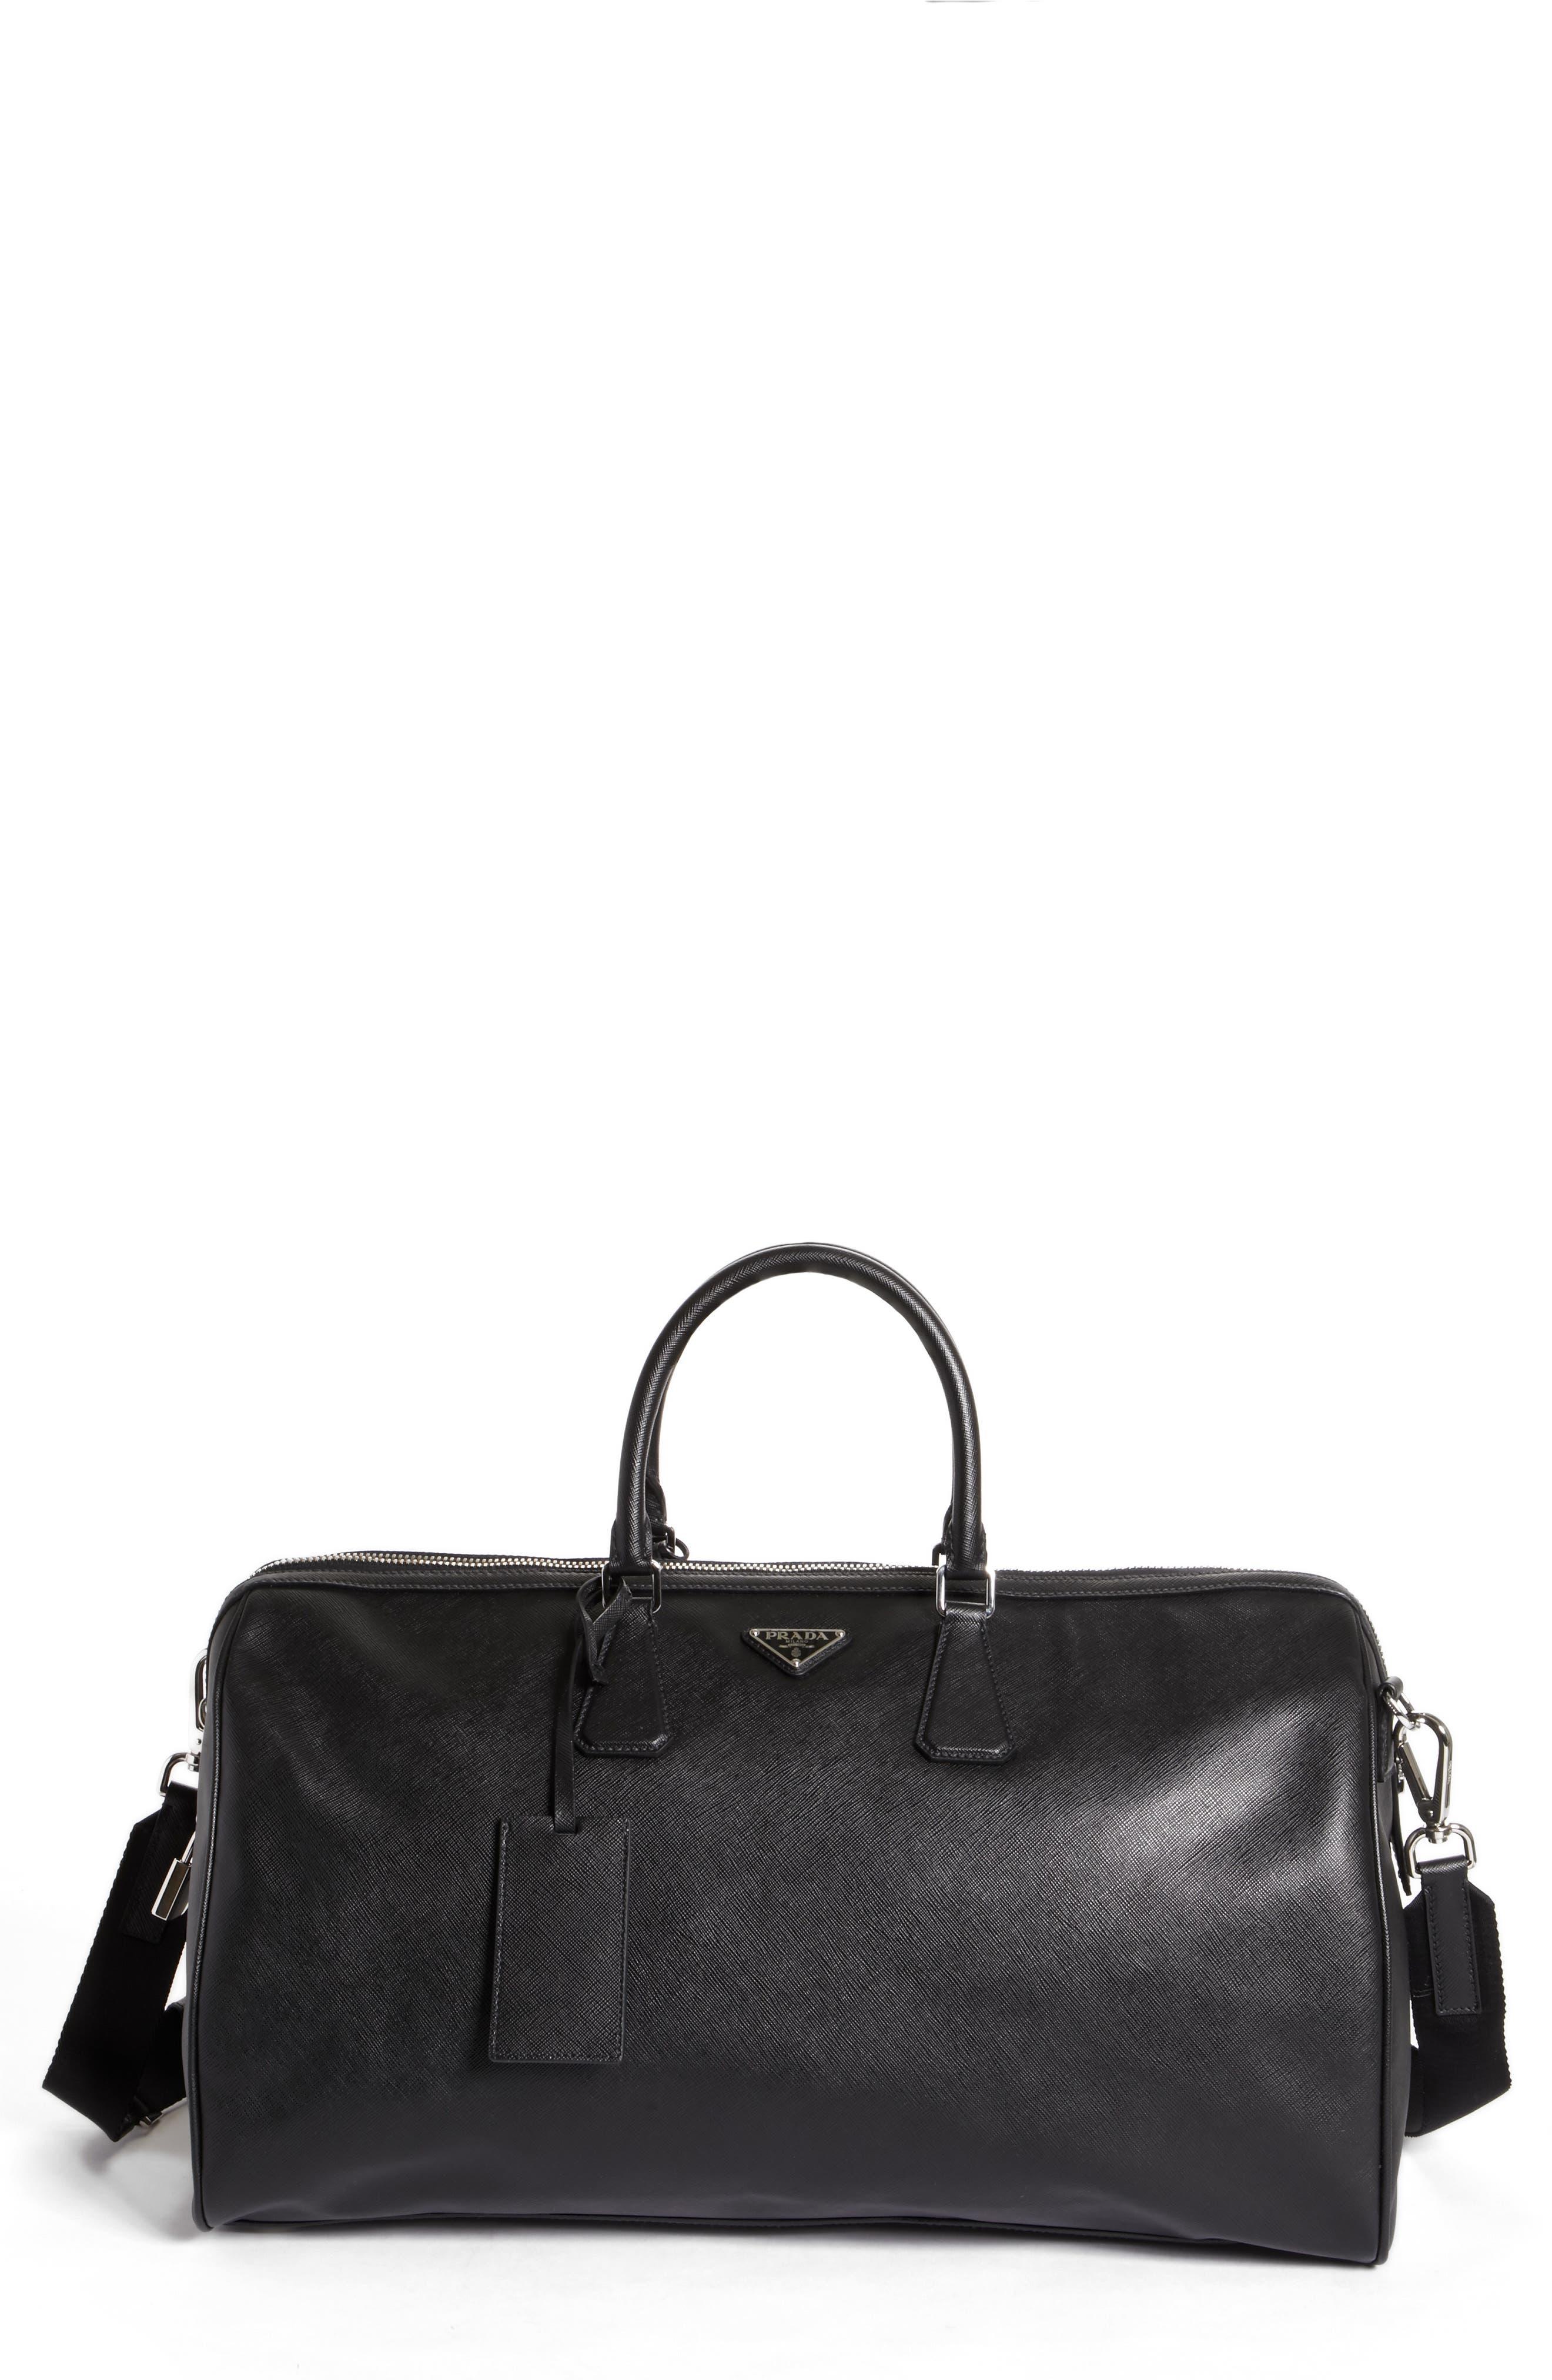 Saffiano Leather Duffel Bag,                             Main thumbnail 1, color,                             001